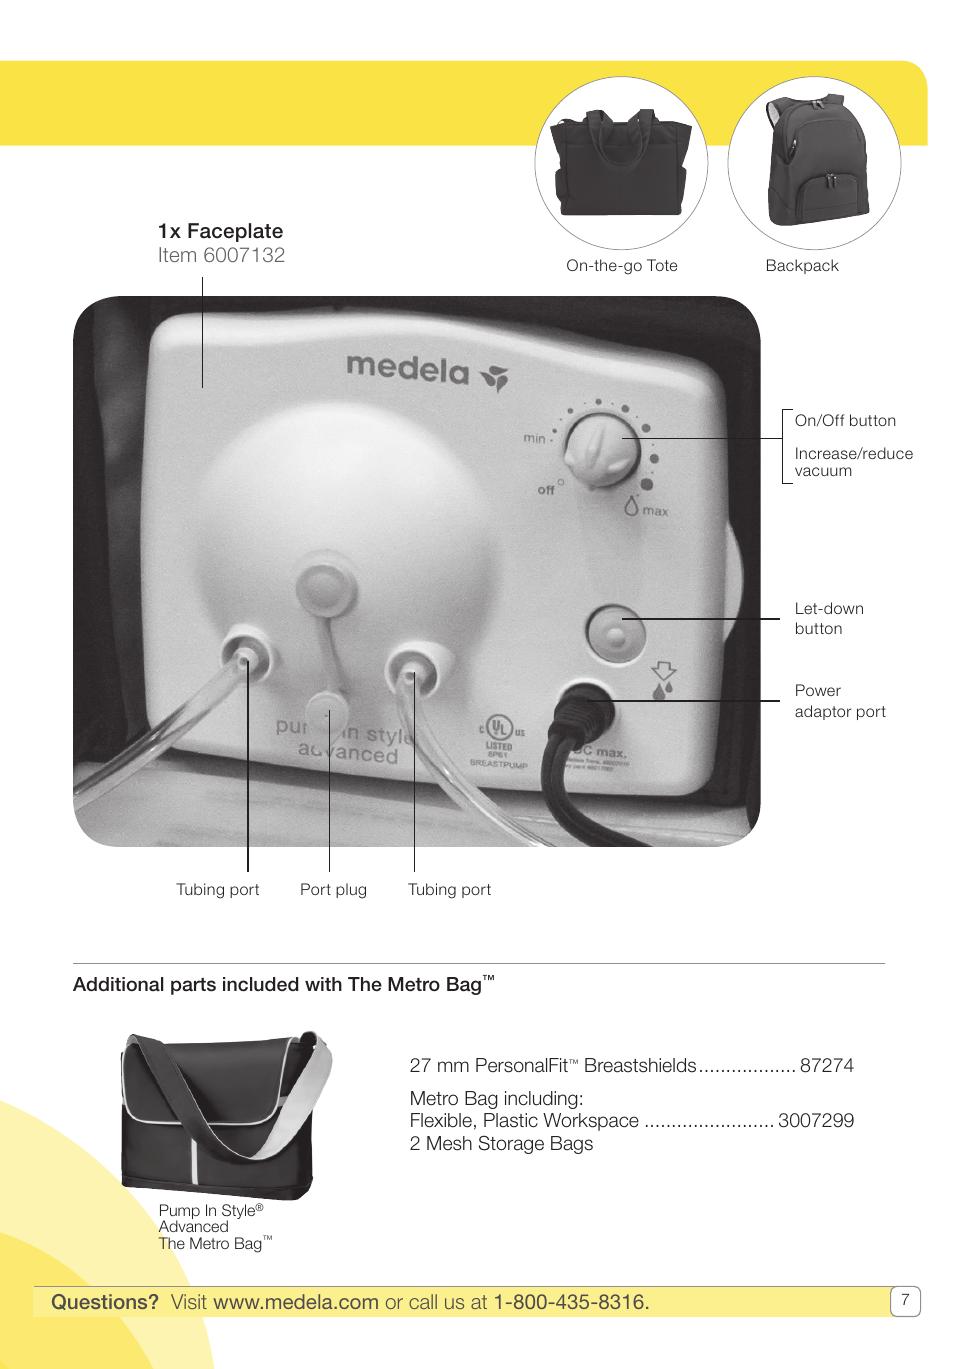 medela pump in style user manual page 7 100 original mode rh manualsdir com Medela Manual Pump Medela Manual Large Flange